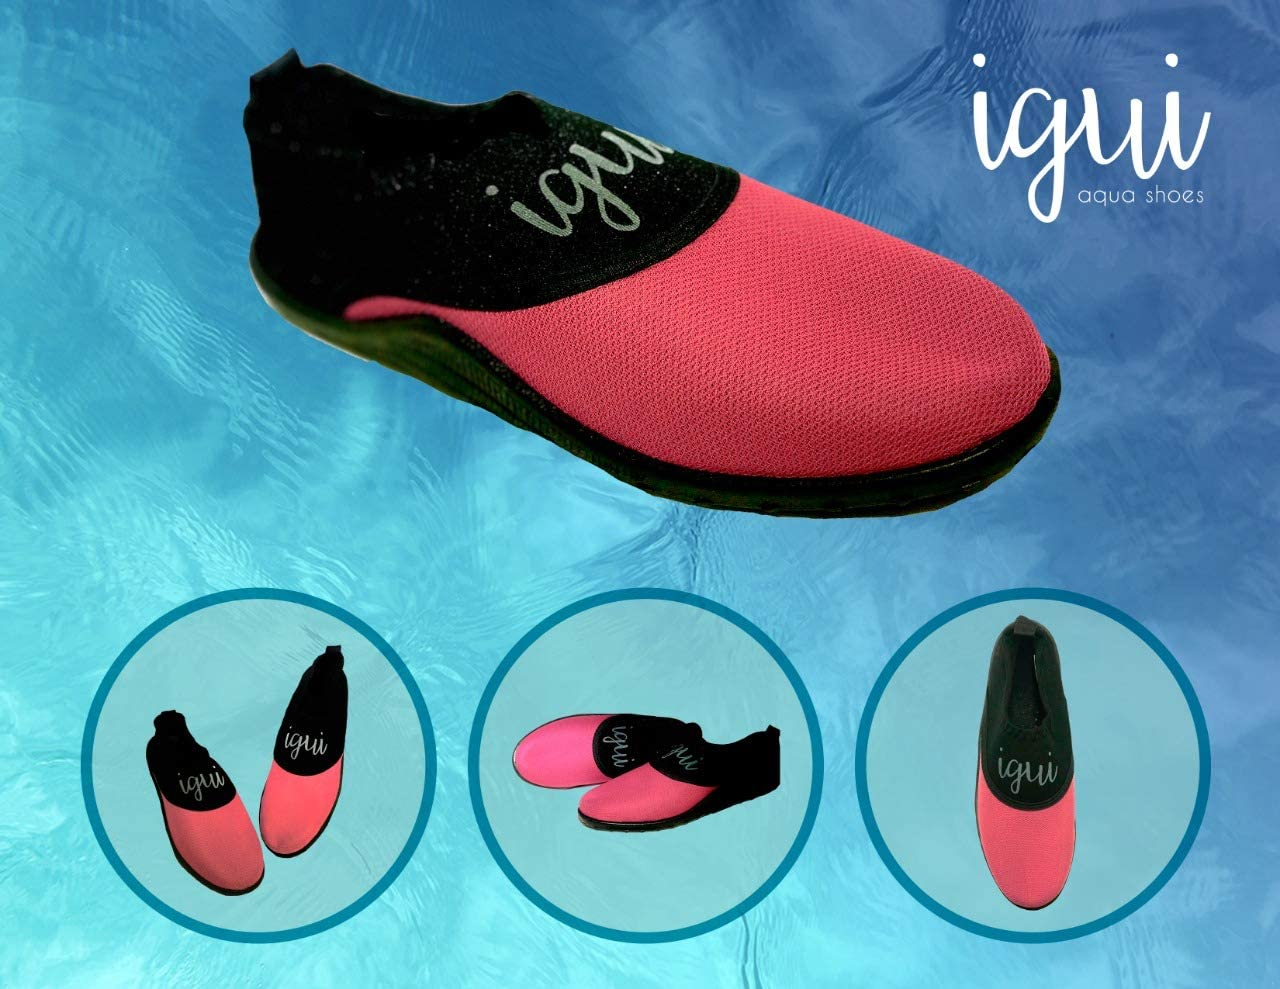 igui Aqua Shoes, Water Shoes, Pink Black Diamond,Water Shoes for Women, Aqua Shoes for Women (1 Pair)